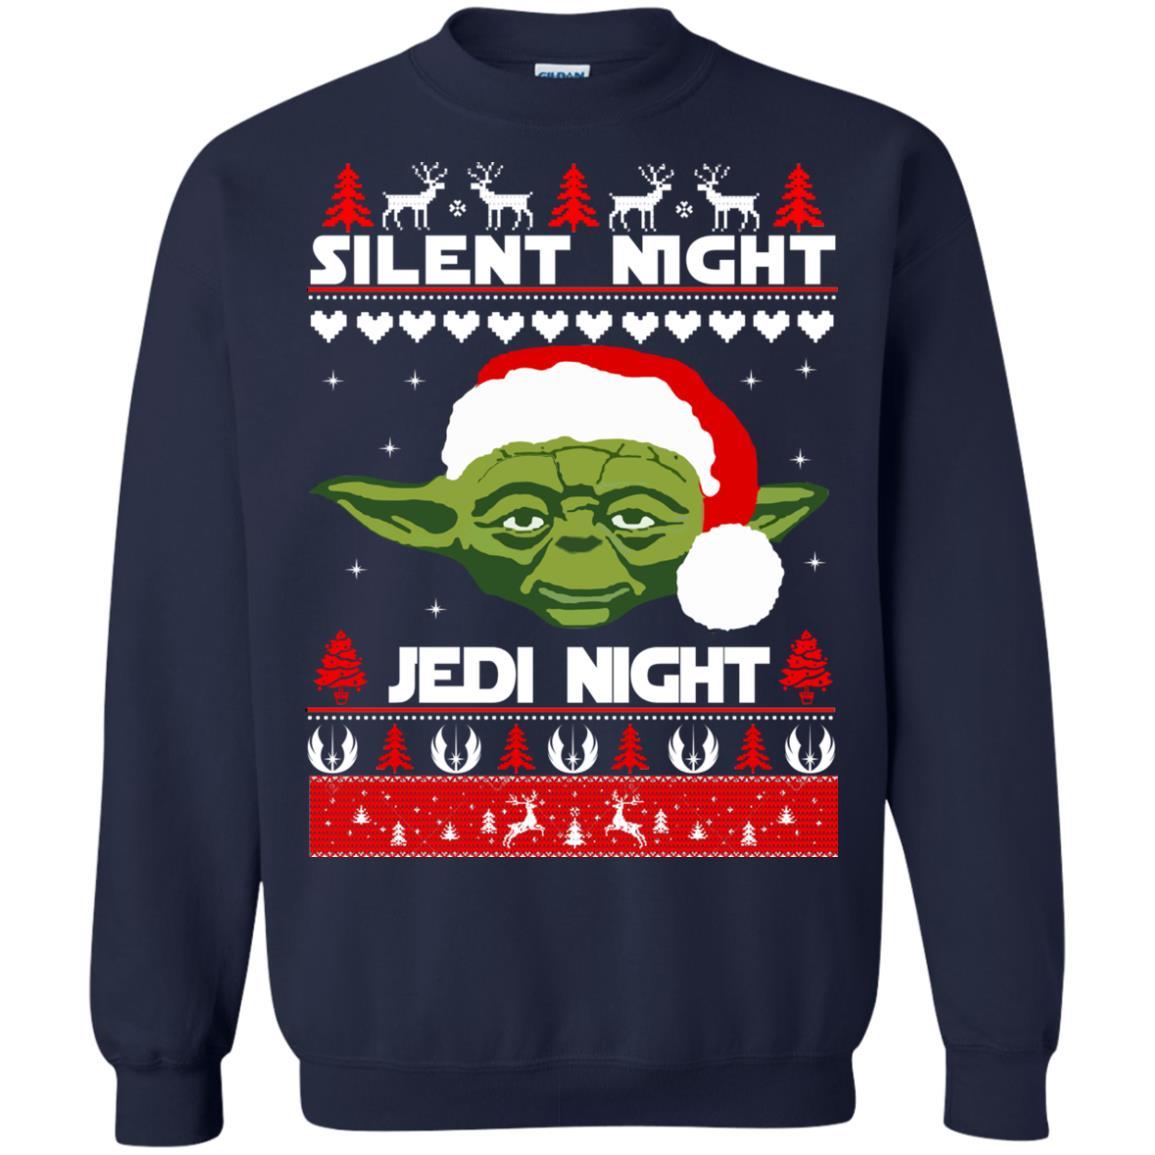 image 1717 - Yoda Star Wars: Silent Night Jedi Night Christmas Sweater, Hoodie